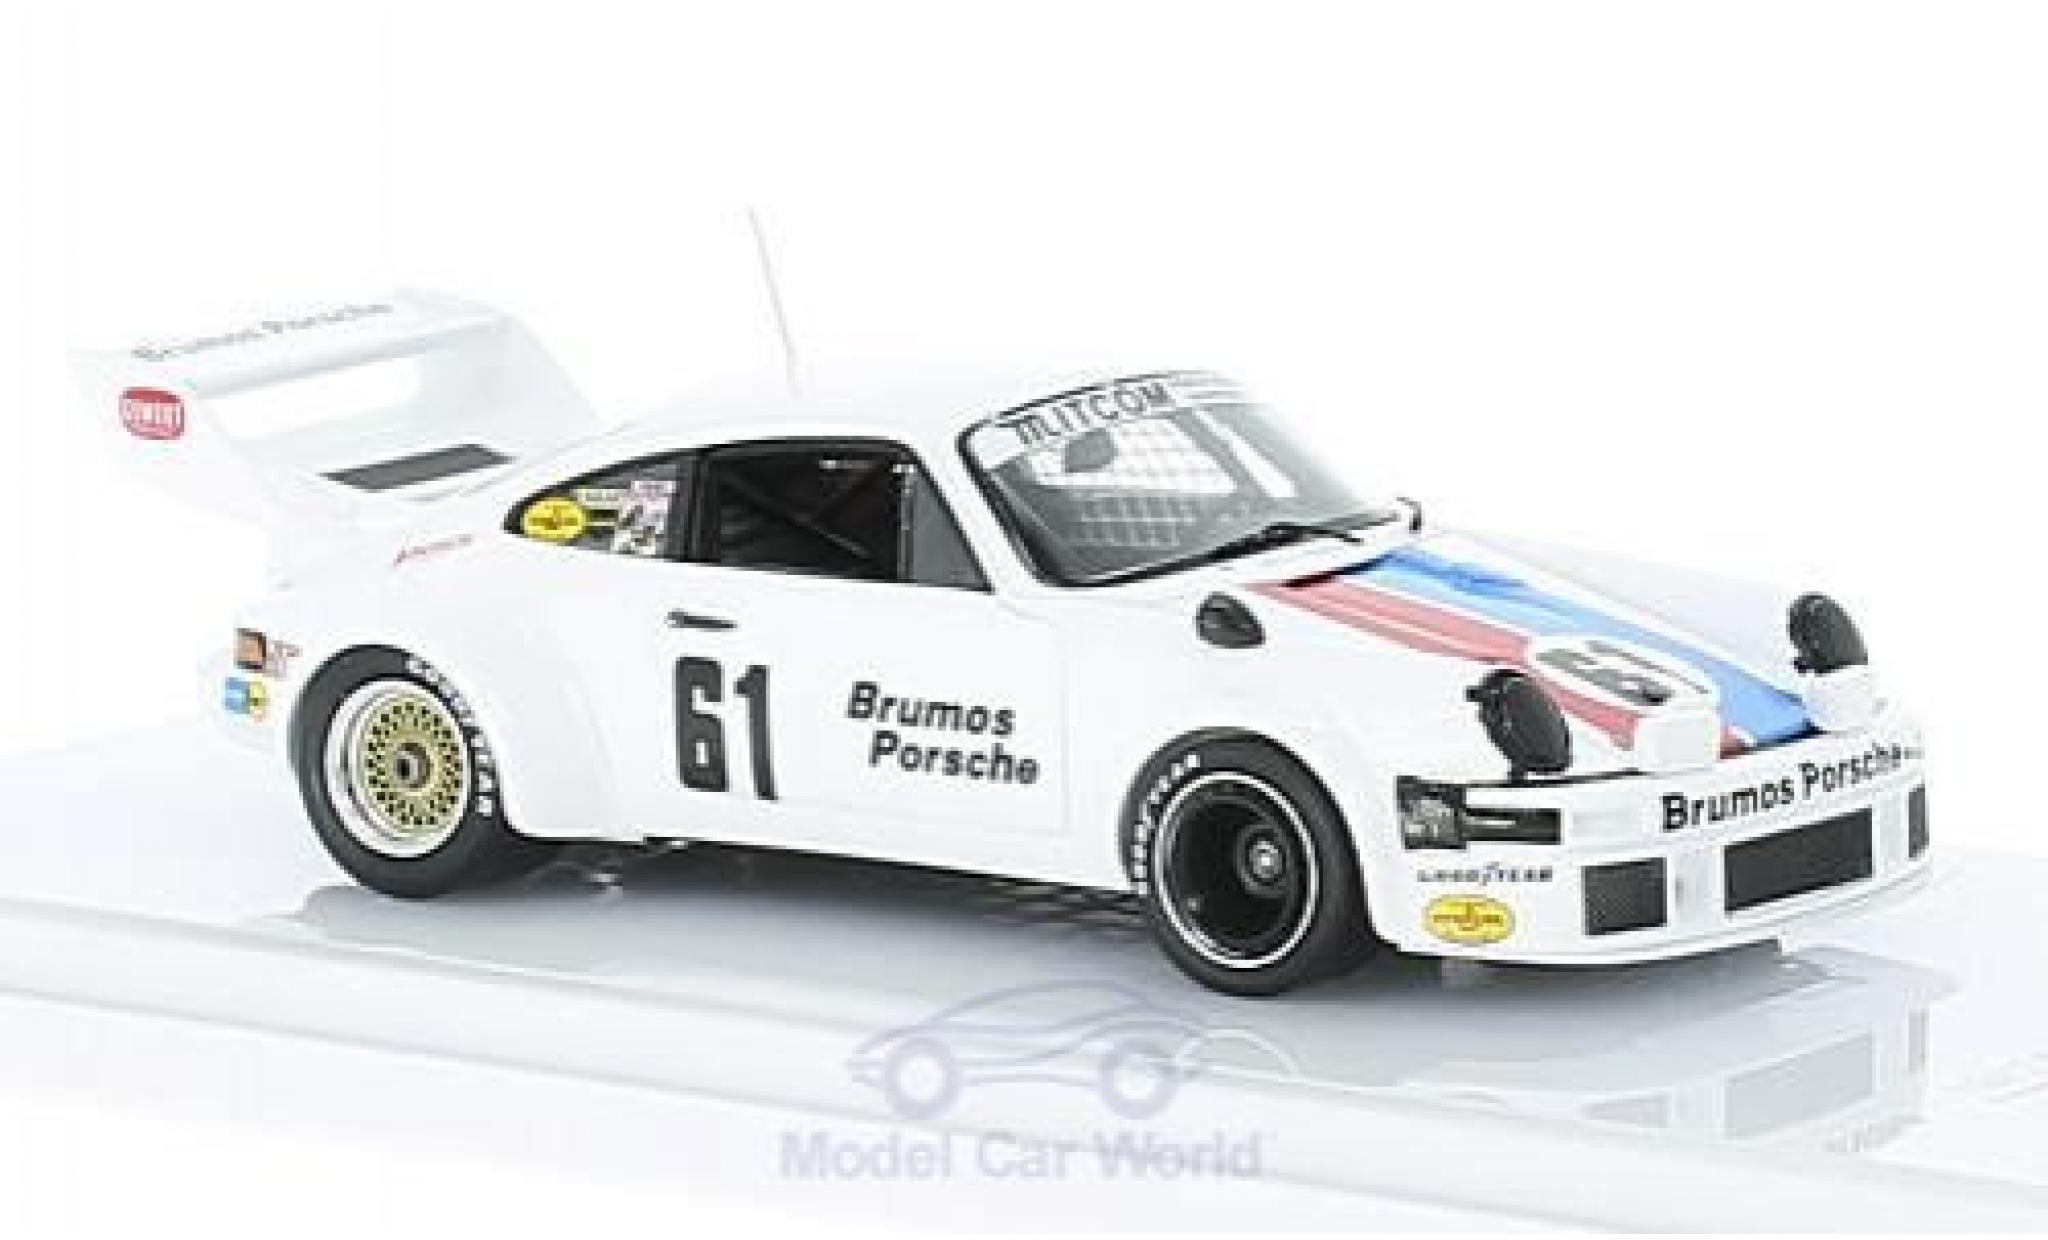 Porsche 934 1/43 TrueScale Miniatures /5 No.61 Brumos Racing 12h Sebring 1977 J.Busby/P.Gregg